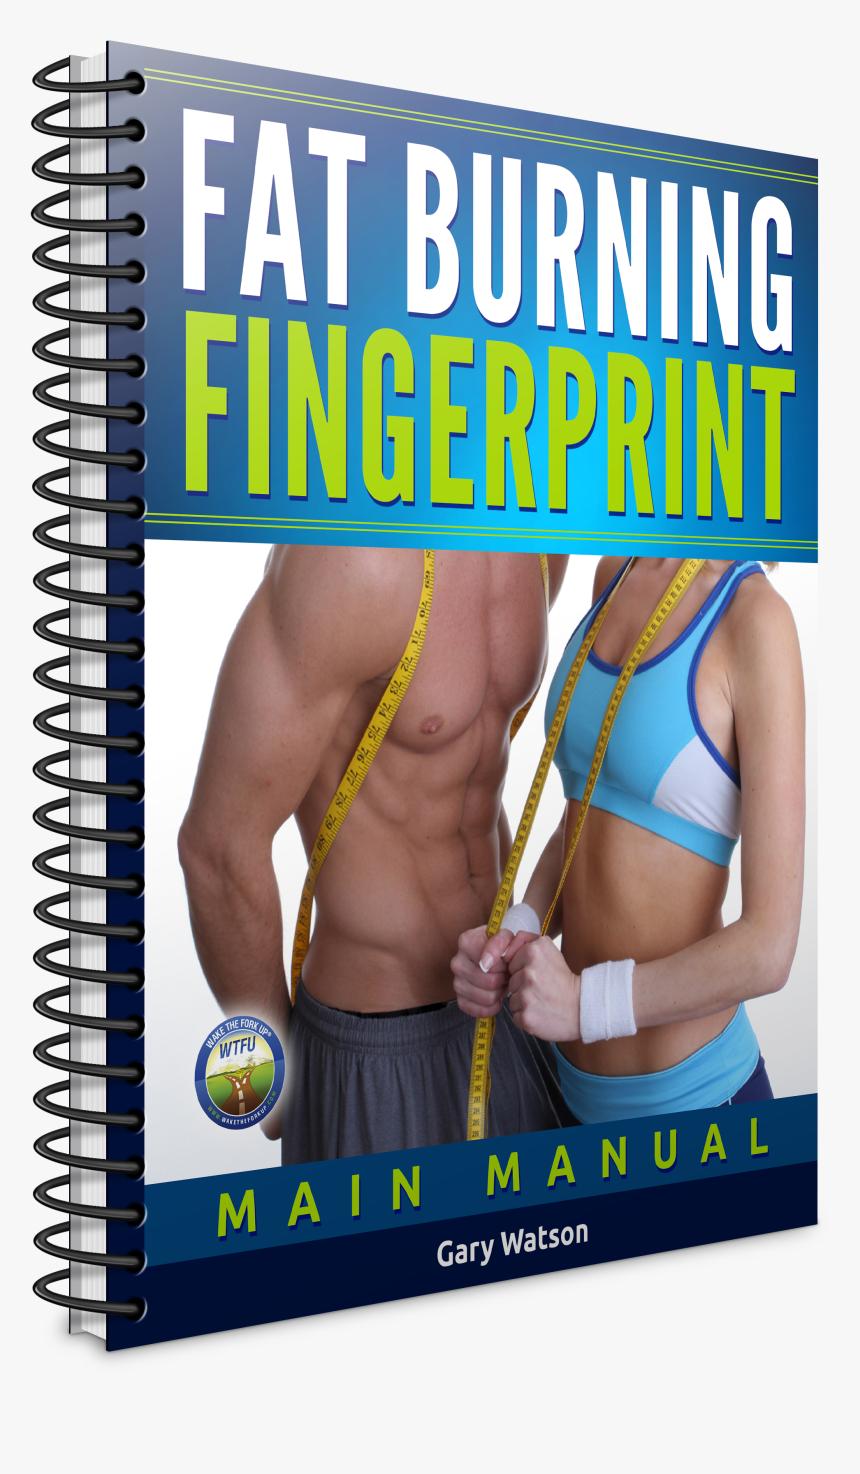 Weight Loss Png Download Fat Burning Fingerprint Review Transparent Png Kindpng